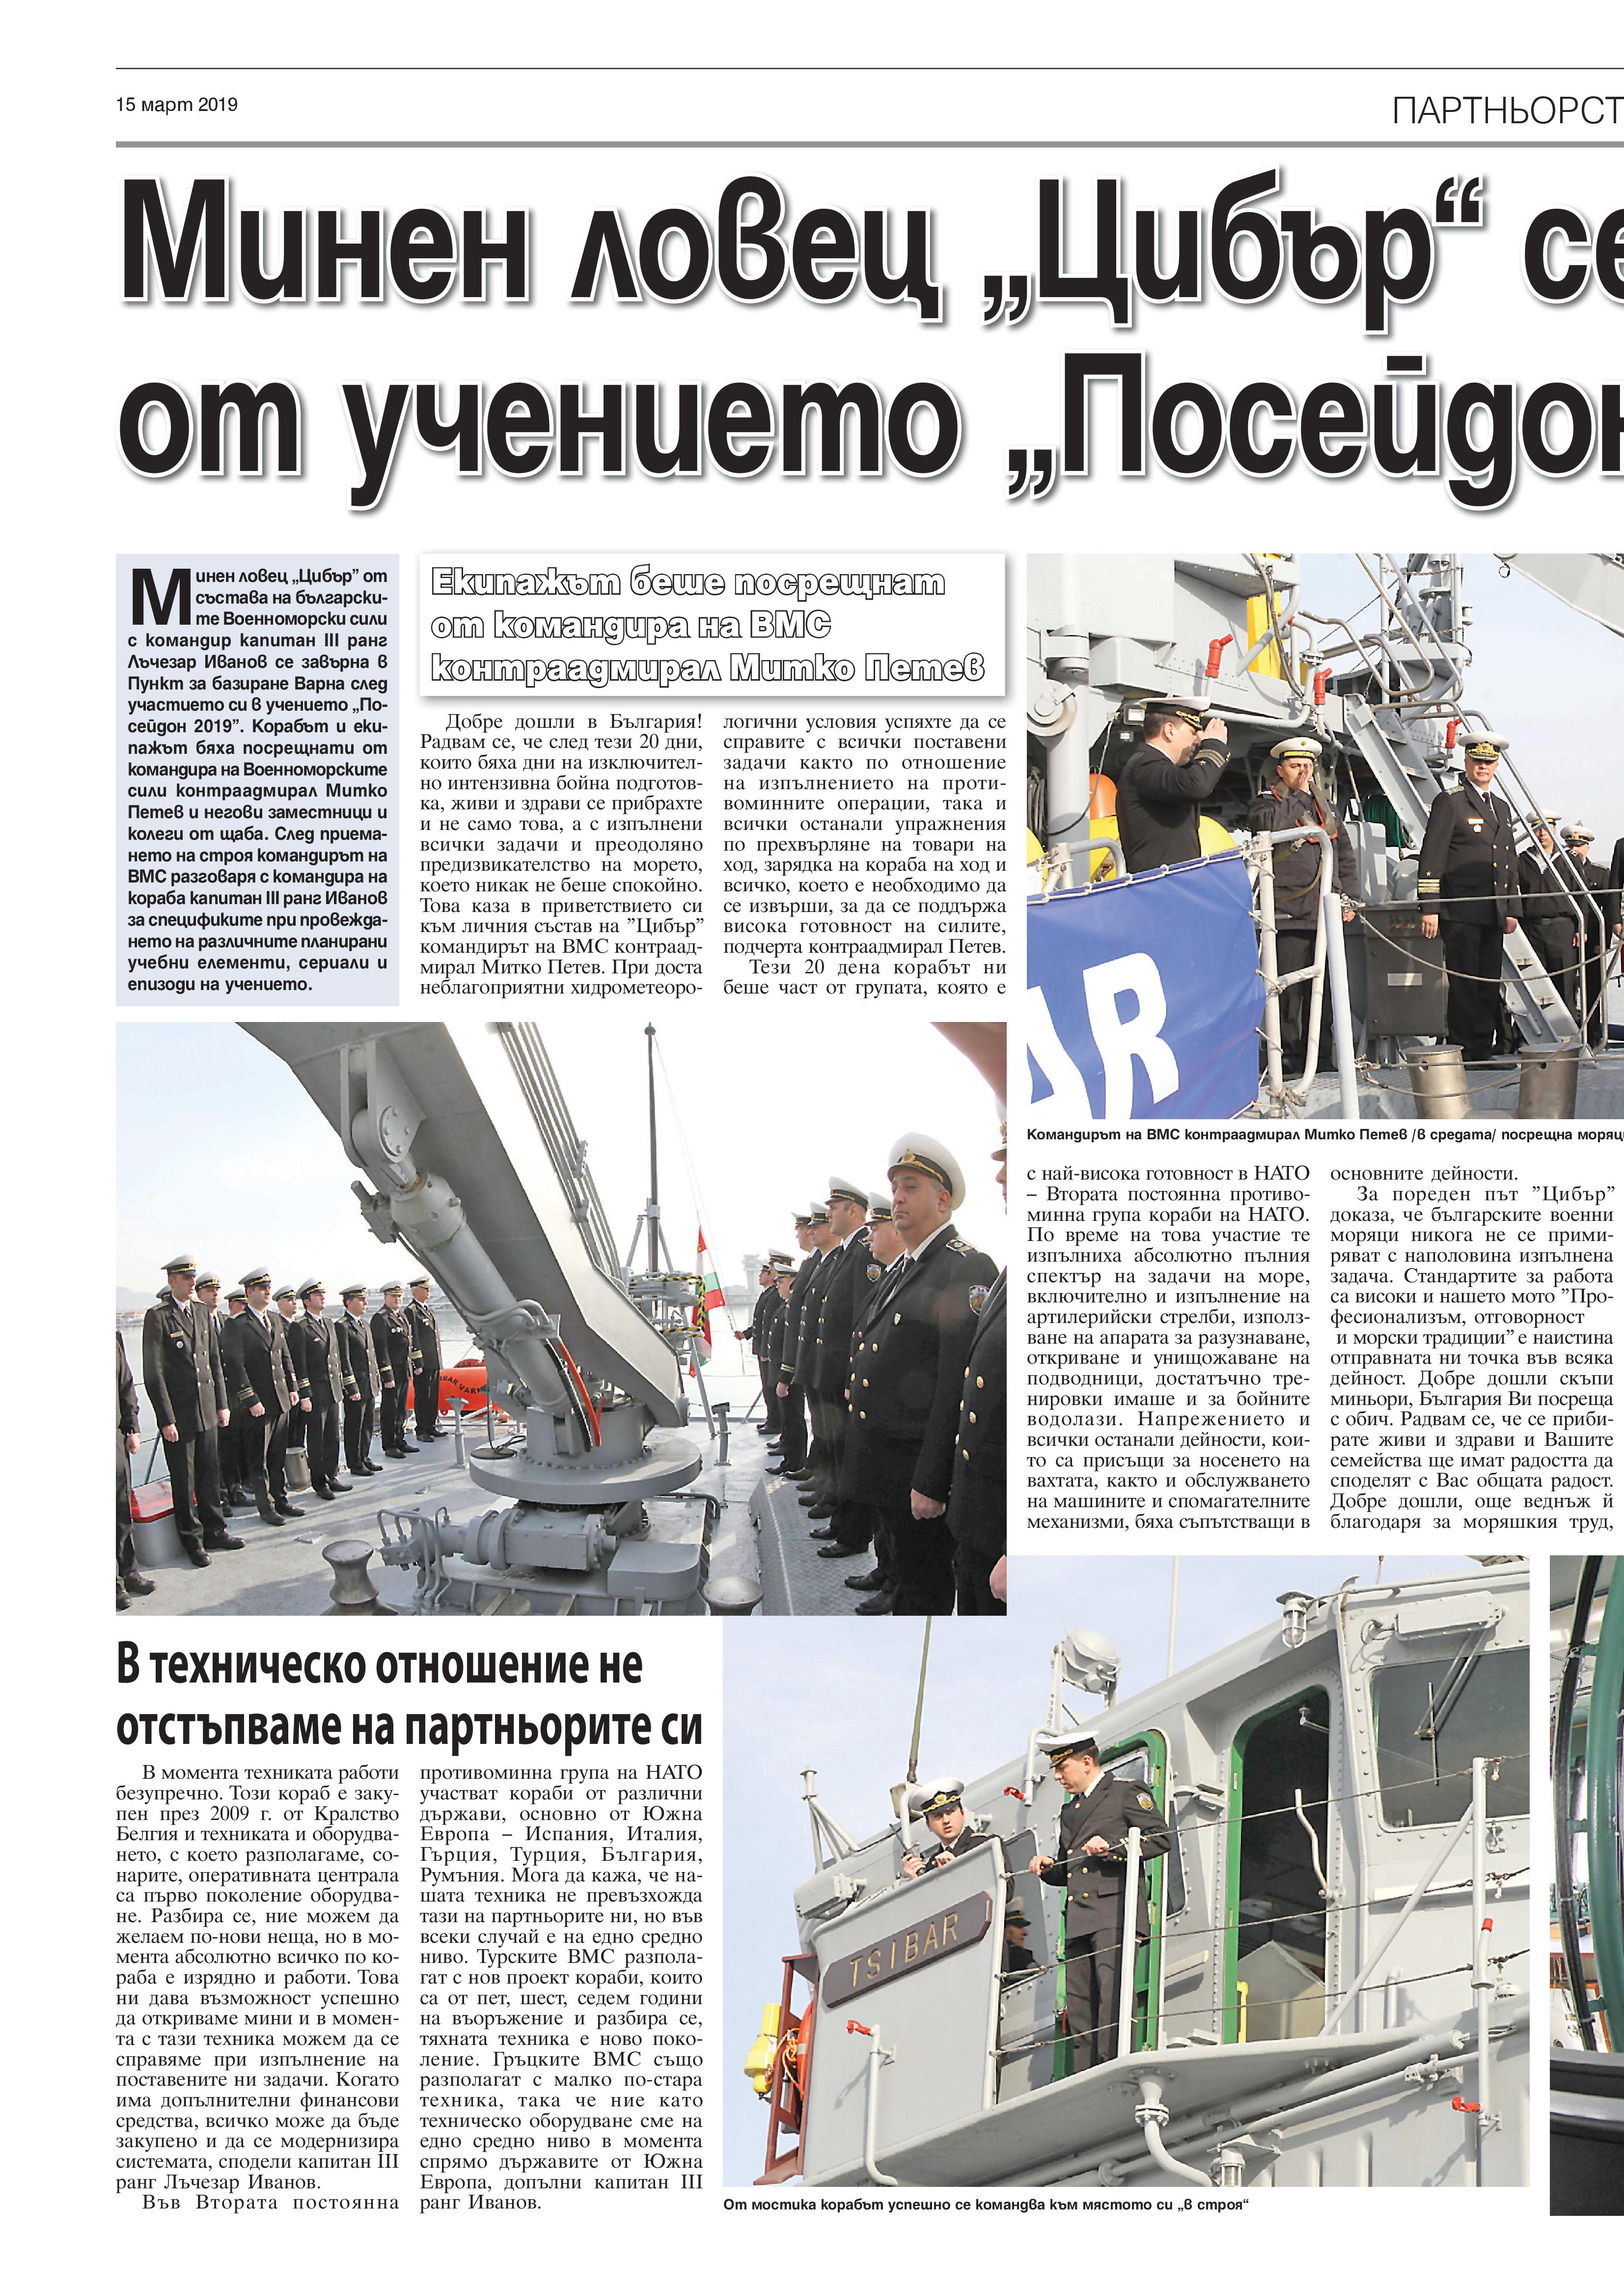 https://armymedia.bg/wp-content/uploads/2015/06/16-27.jpg